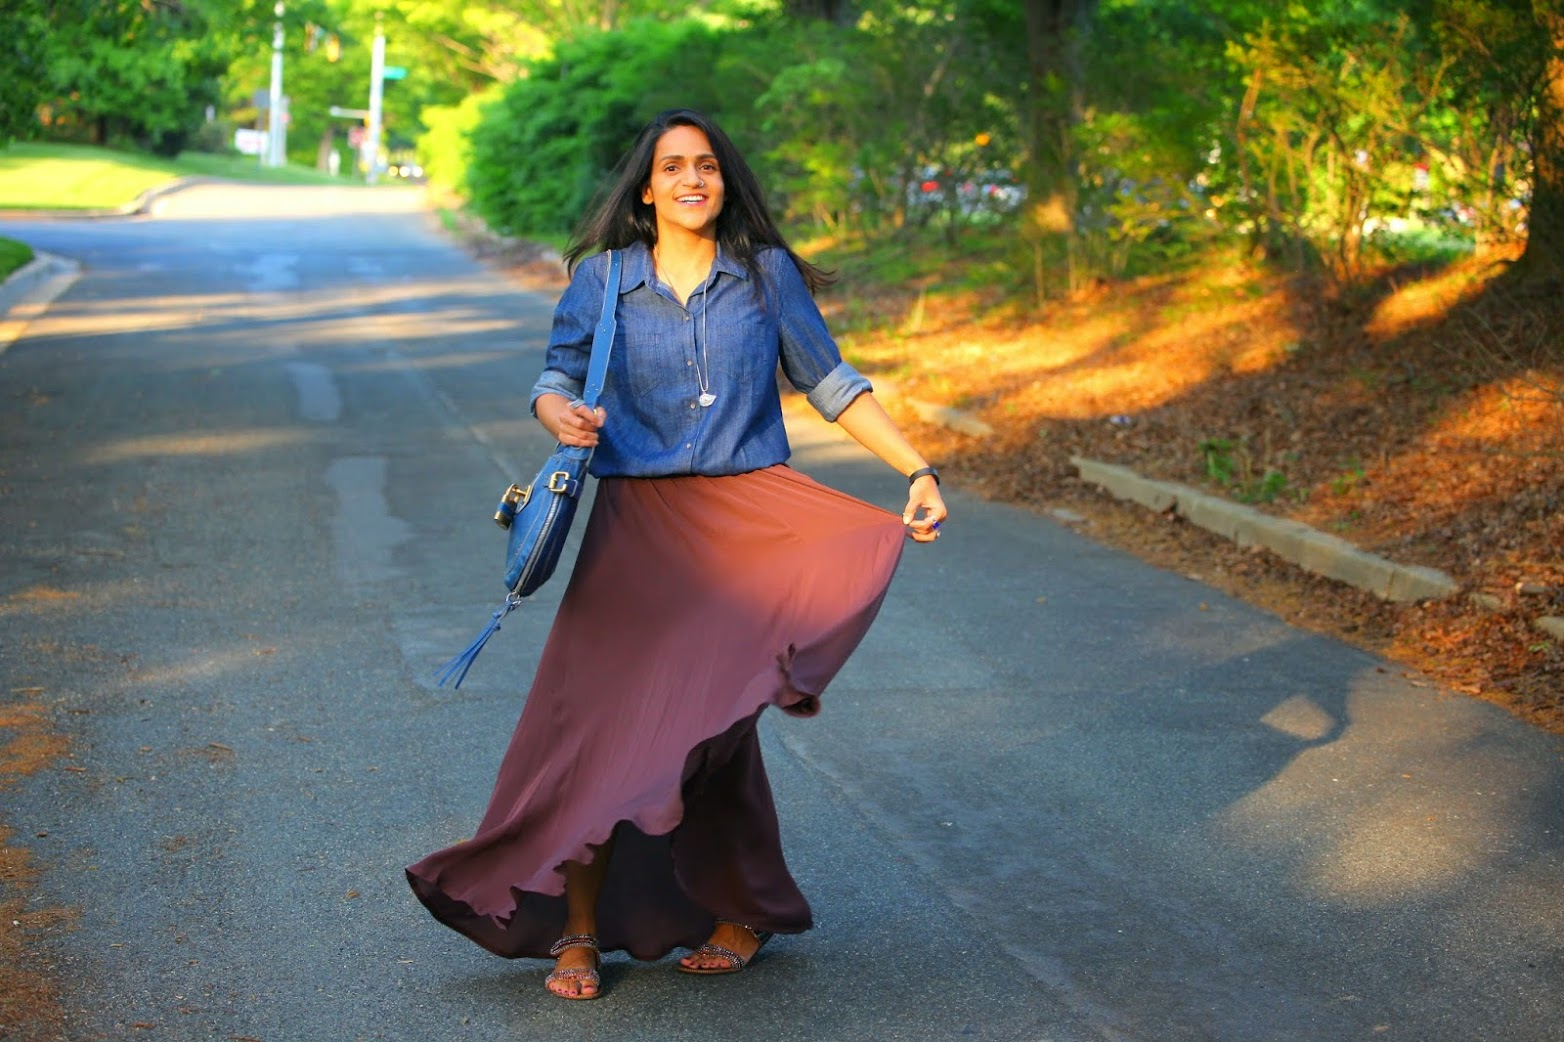 Chambray Shirt - GAP Maxi Skirt - Stylein, Footwear - From India Bag - Chloe Tanvii.com